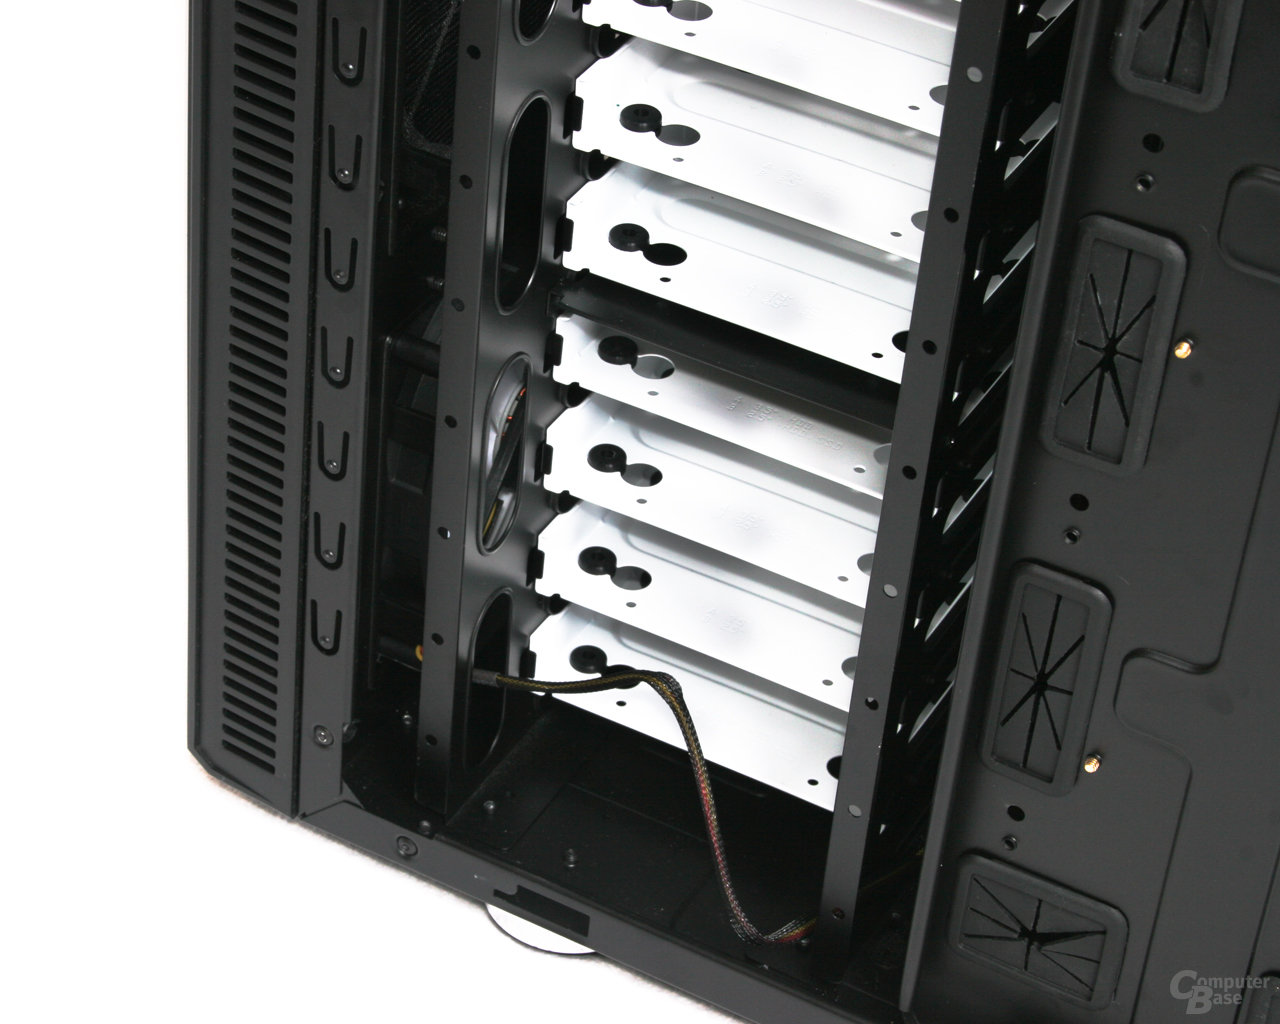 Fractal Design Define R2 – Festplattenhalterung rechts